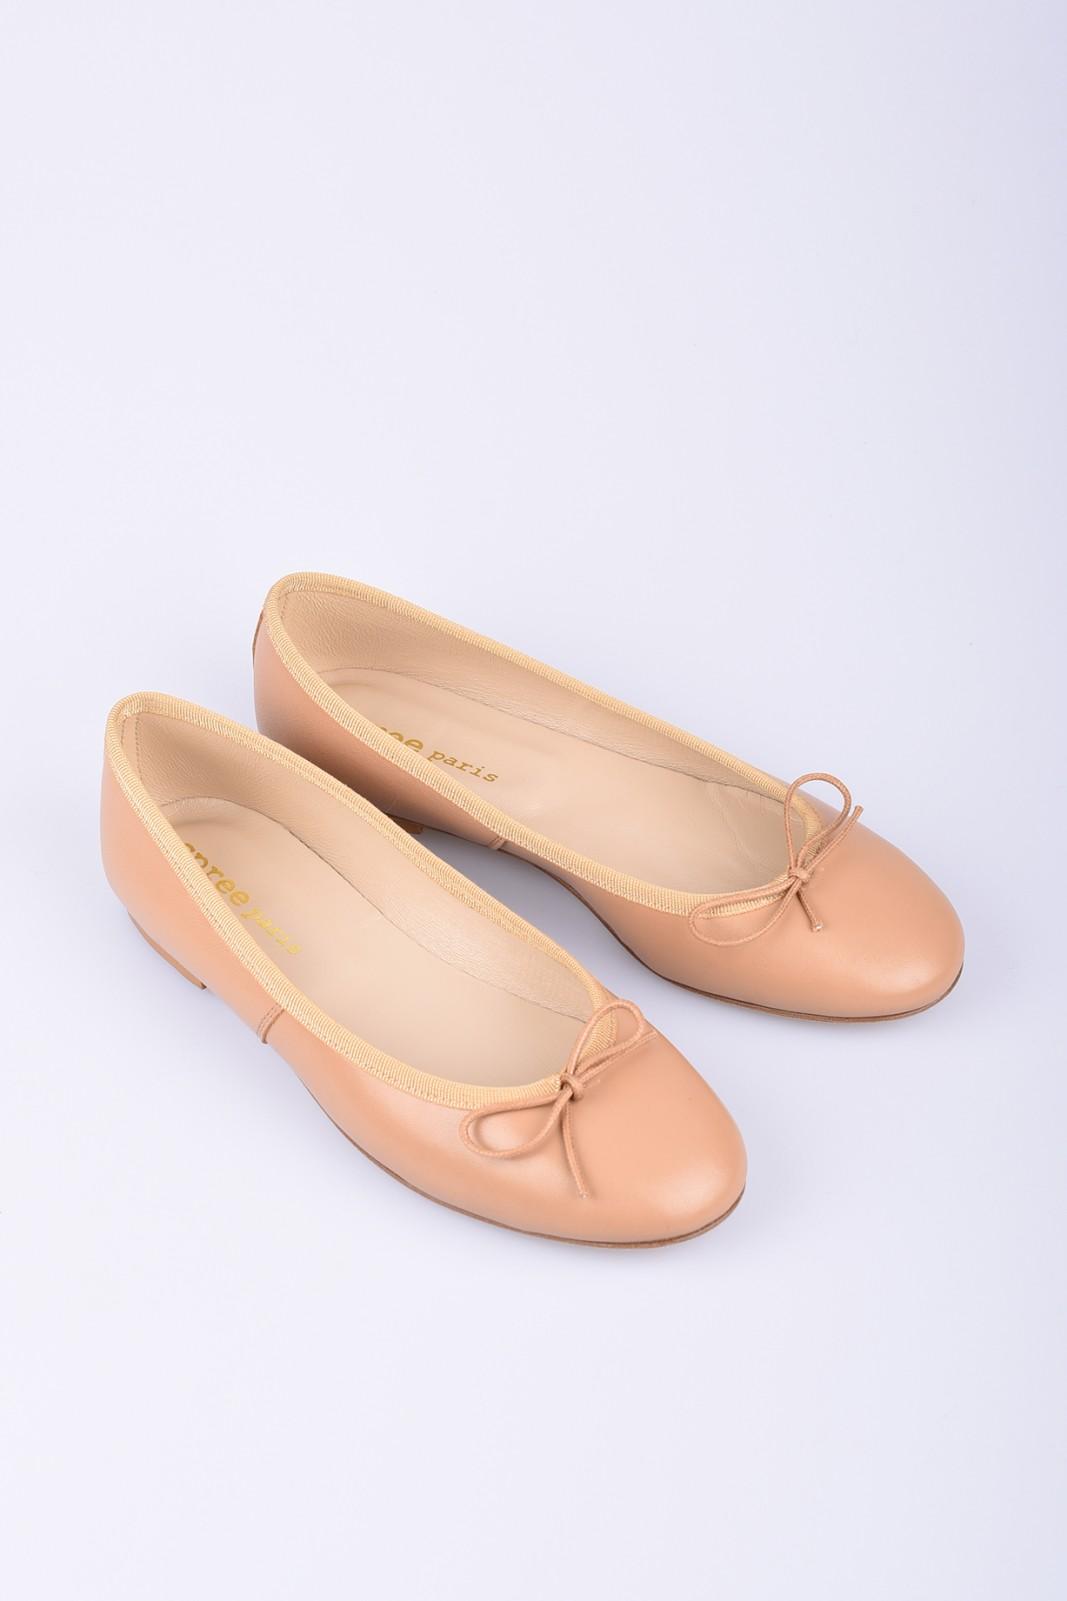 SPREE nude leather ballerinas